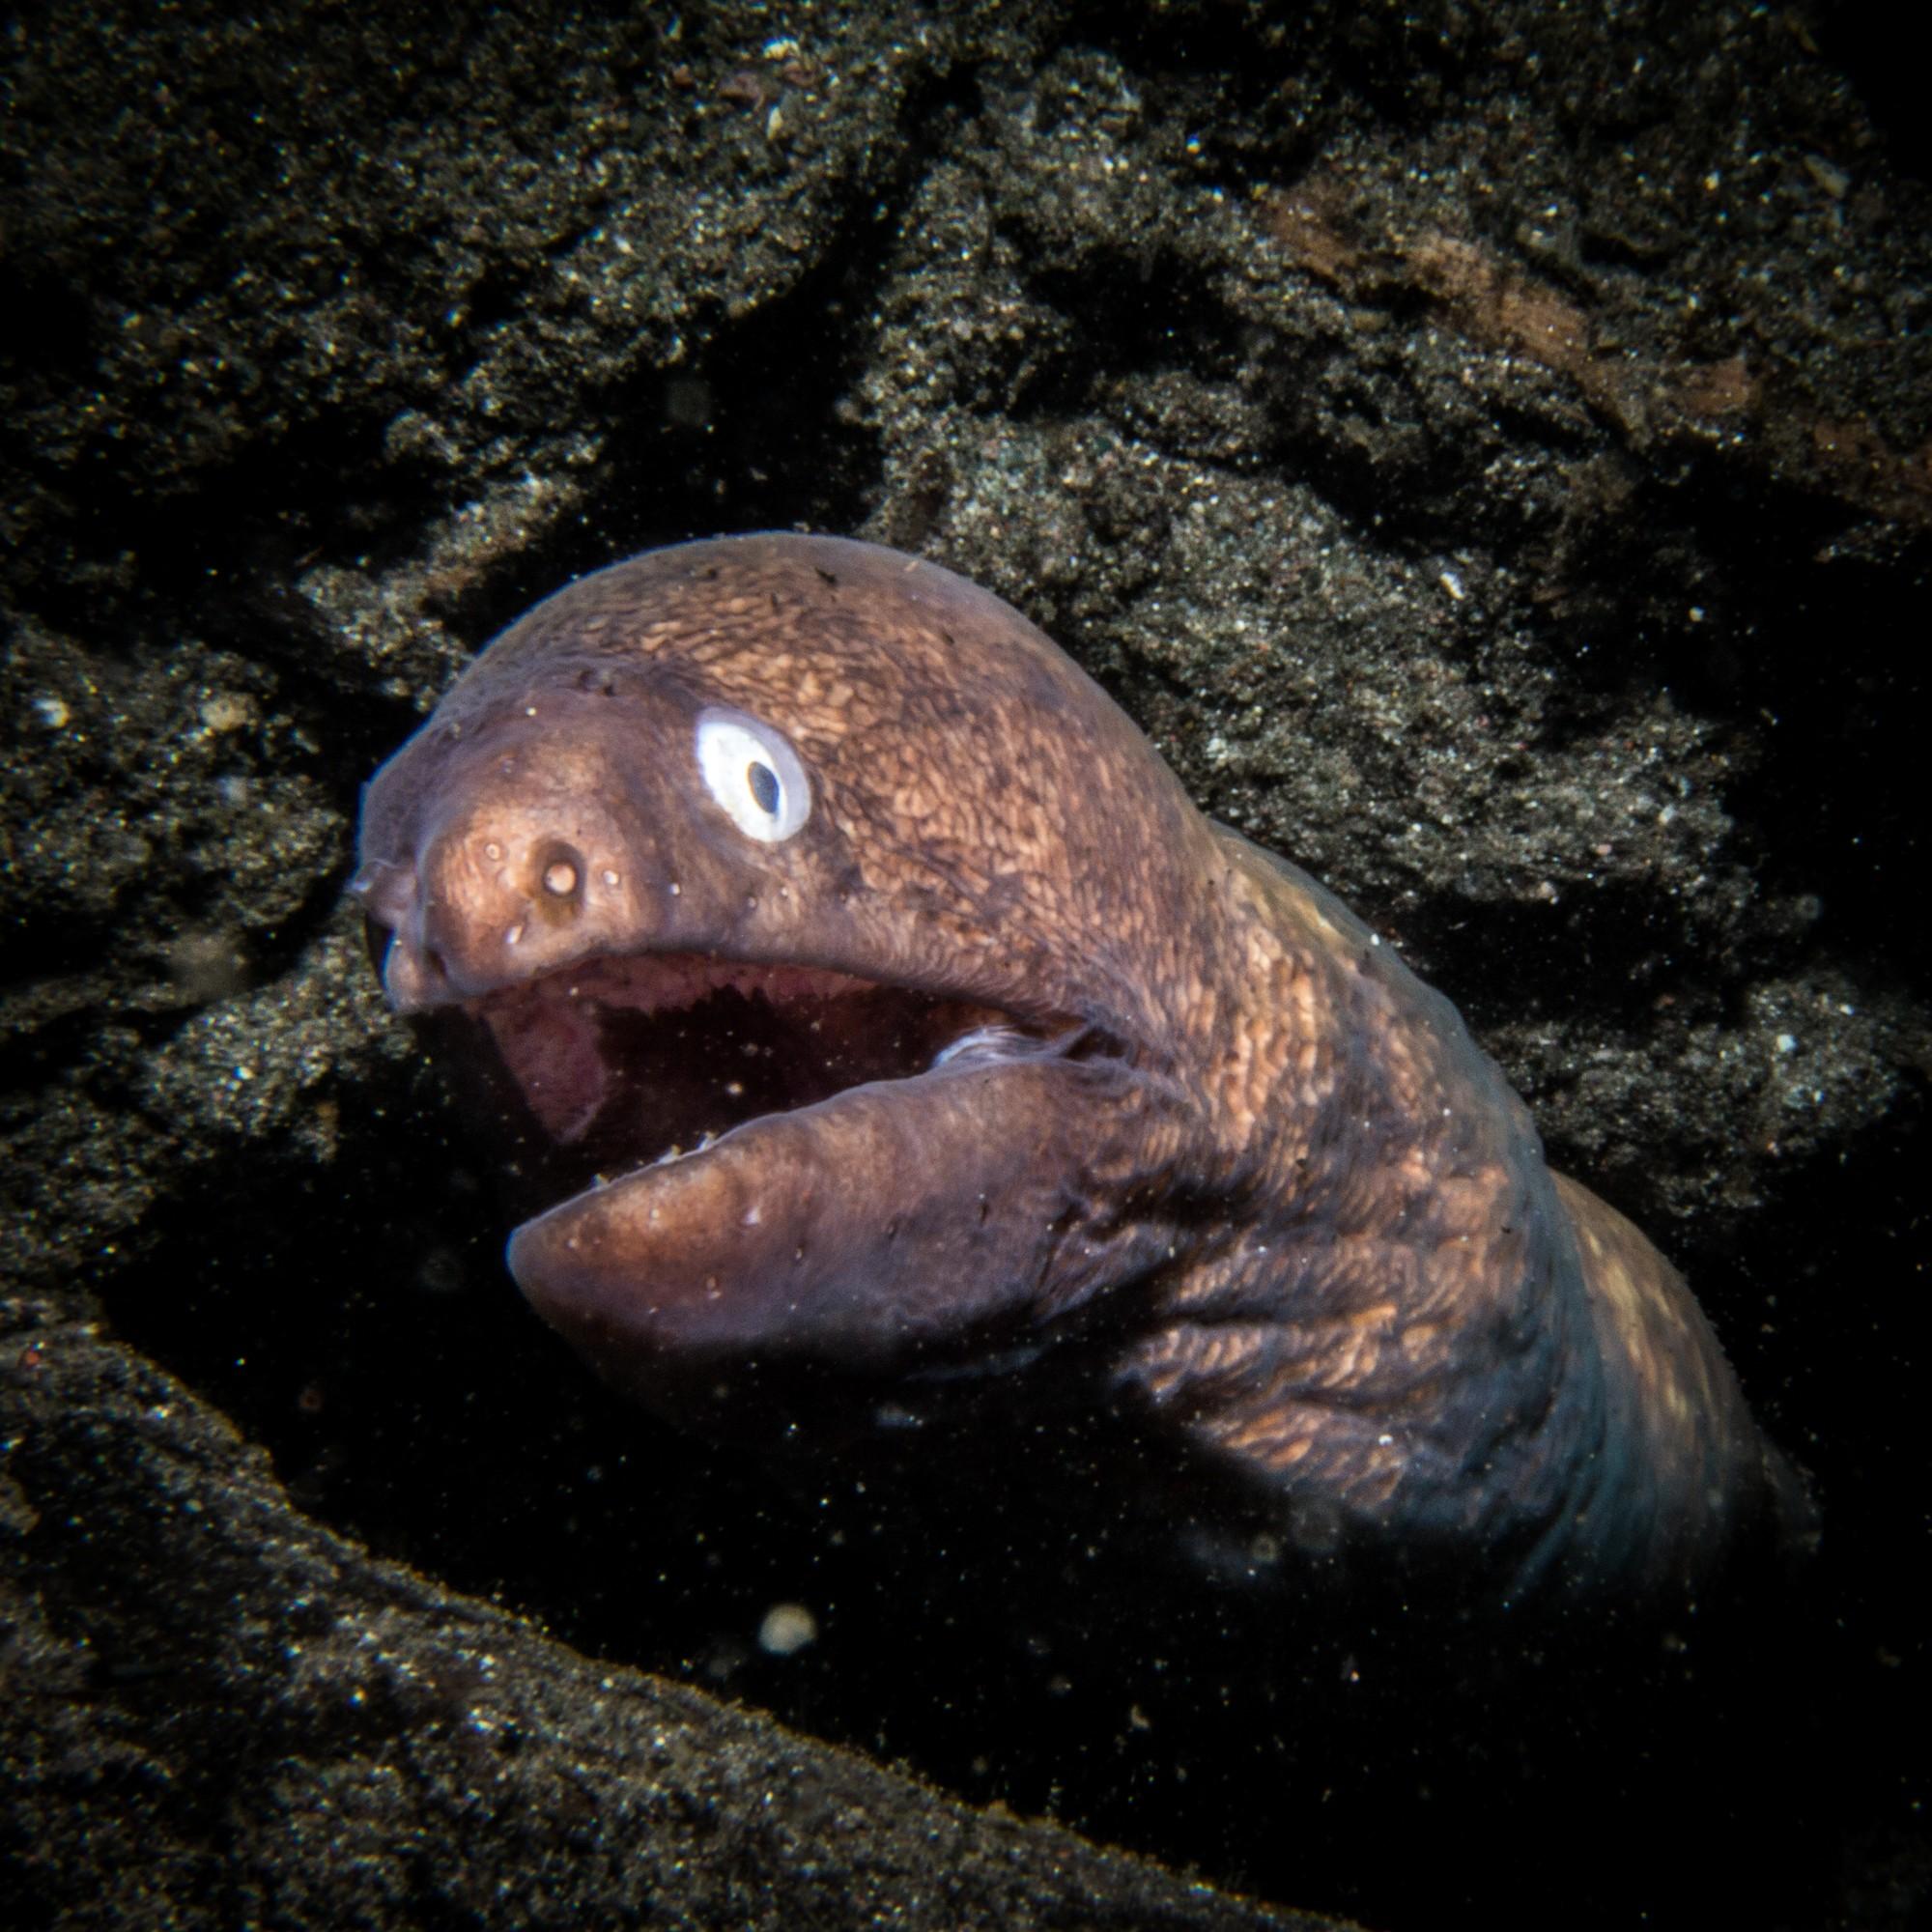 Waiterang wreck dive site Maumere Murray eels